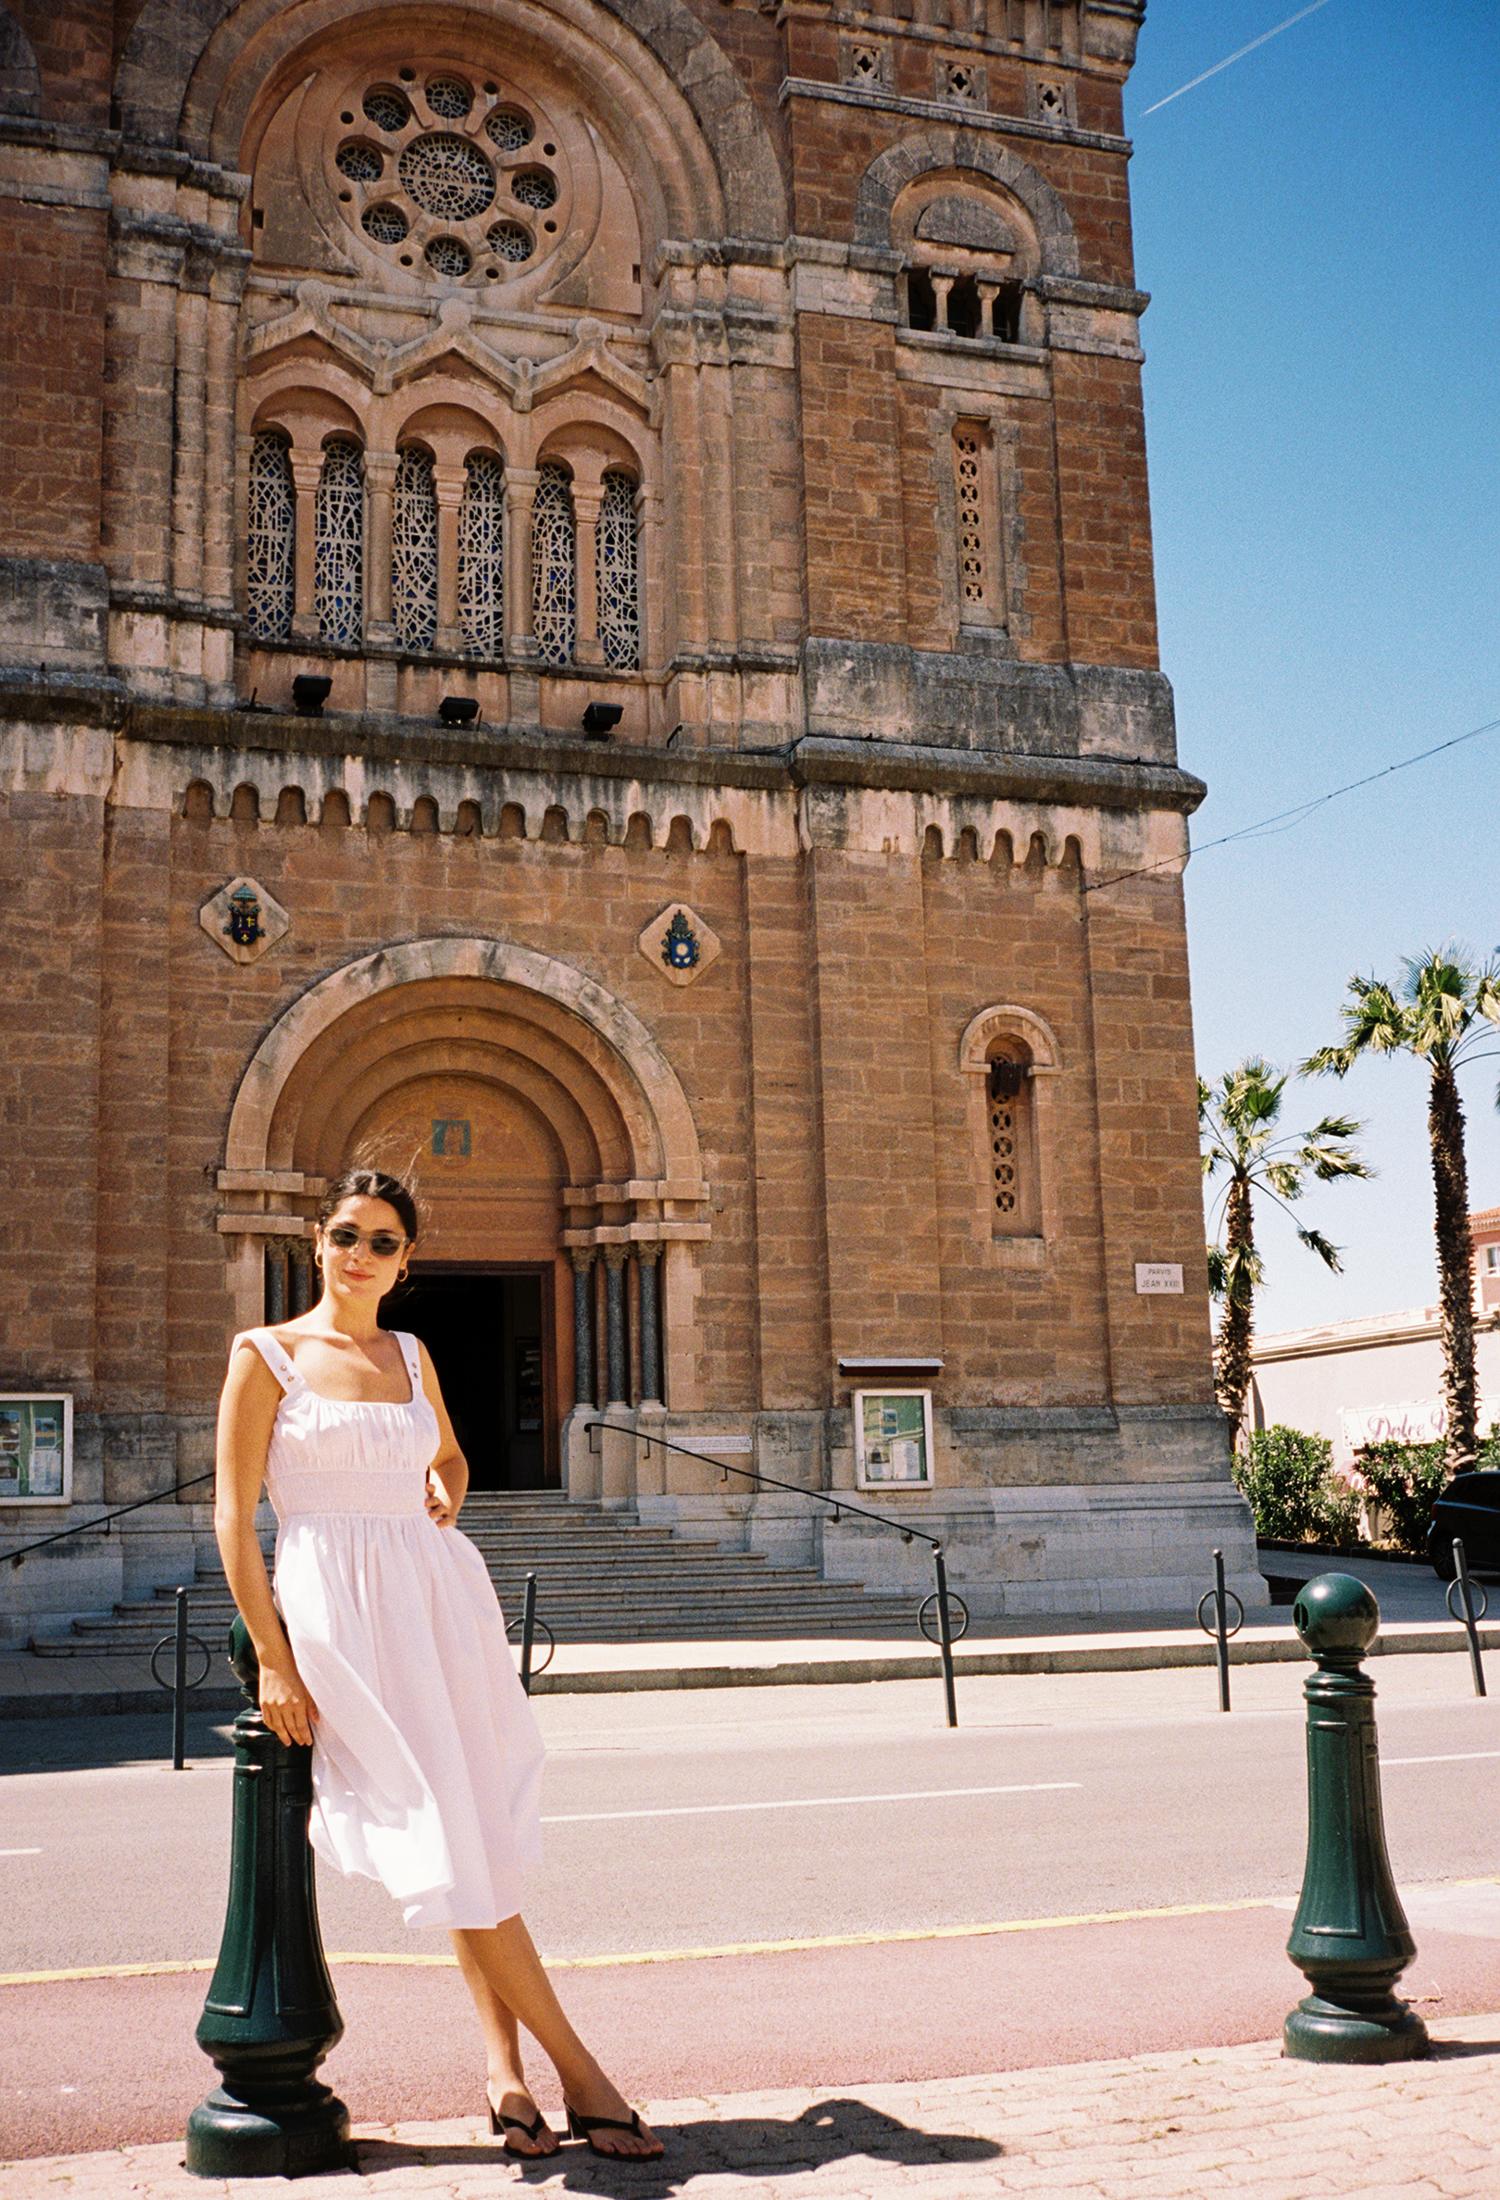 CIAO_LUCIA_GUIDE_FRENCH_RIVERA_ELIANA_RODRIGUEZ_HOTEL_WEEKEND3.jpg